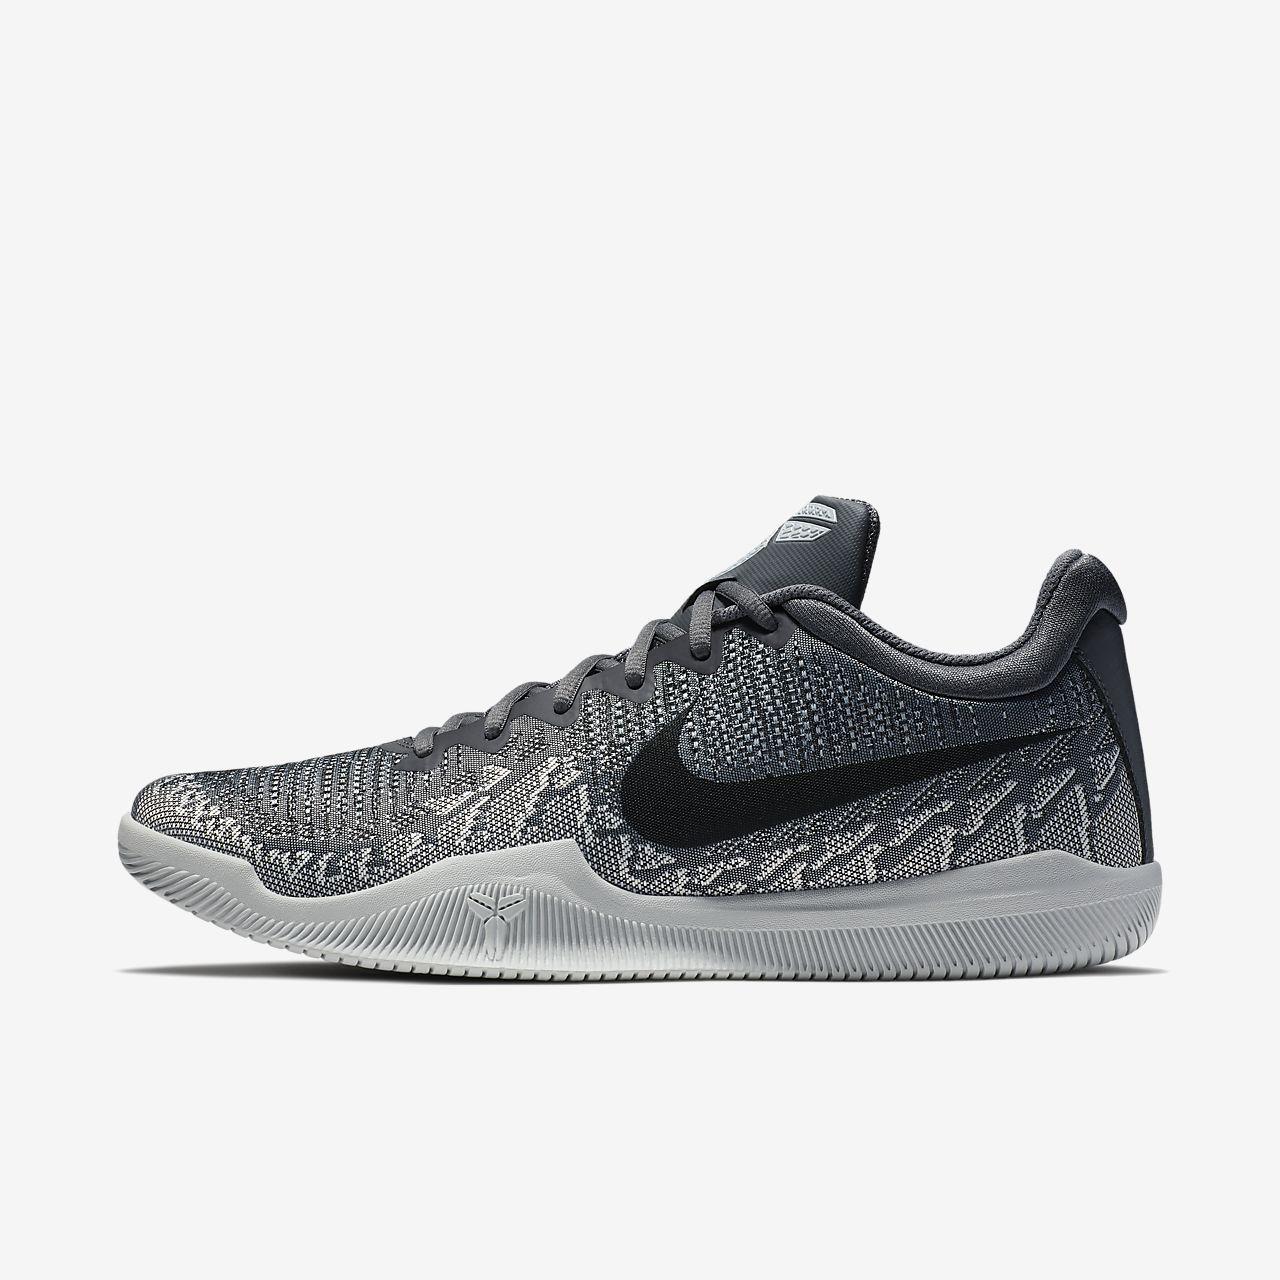 ... Nike Mamba Rage Men's Basketball Shoe